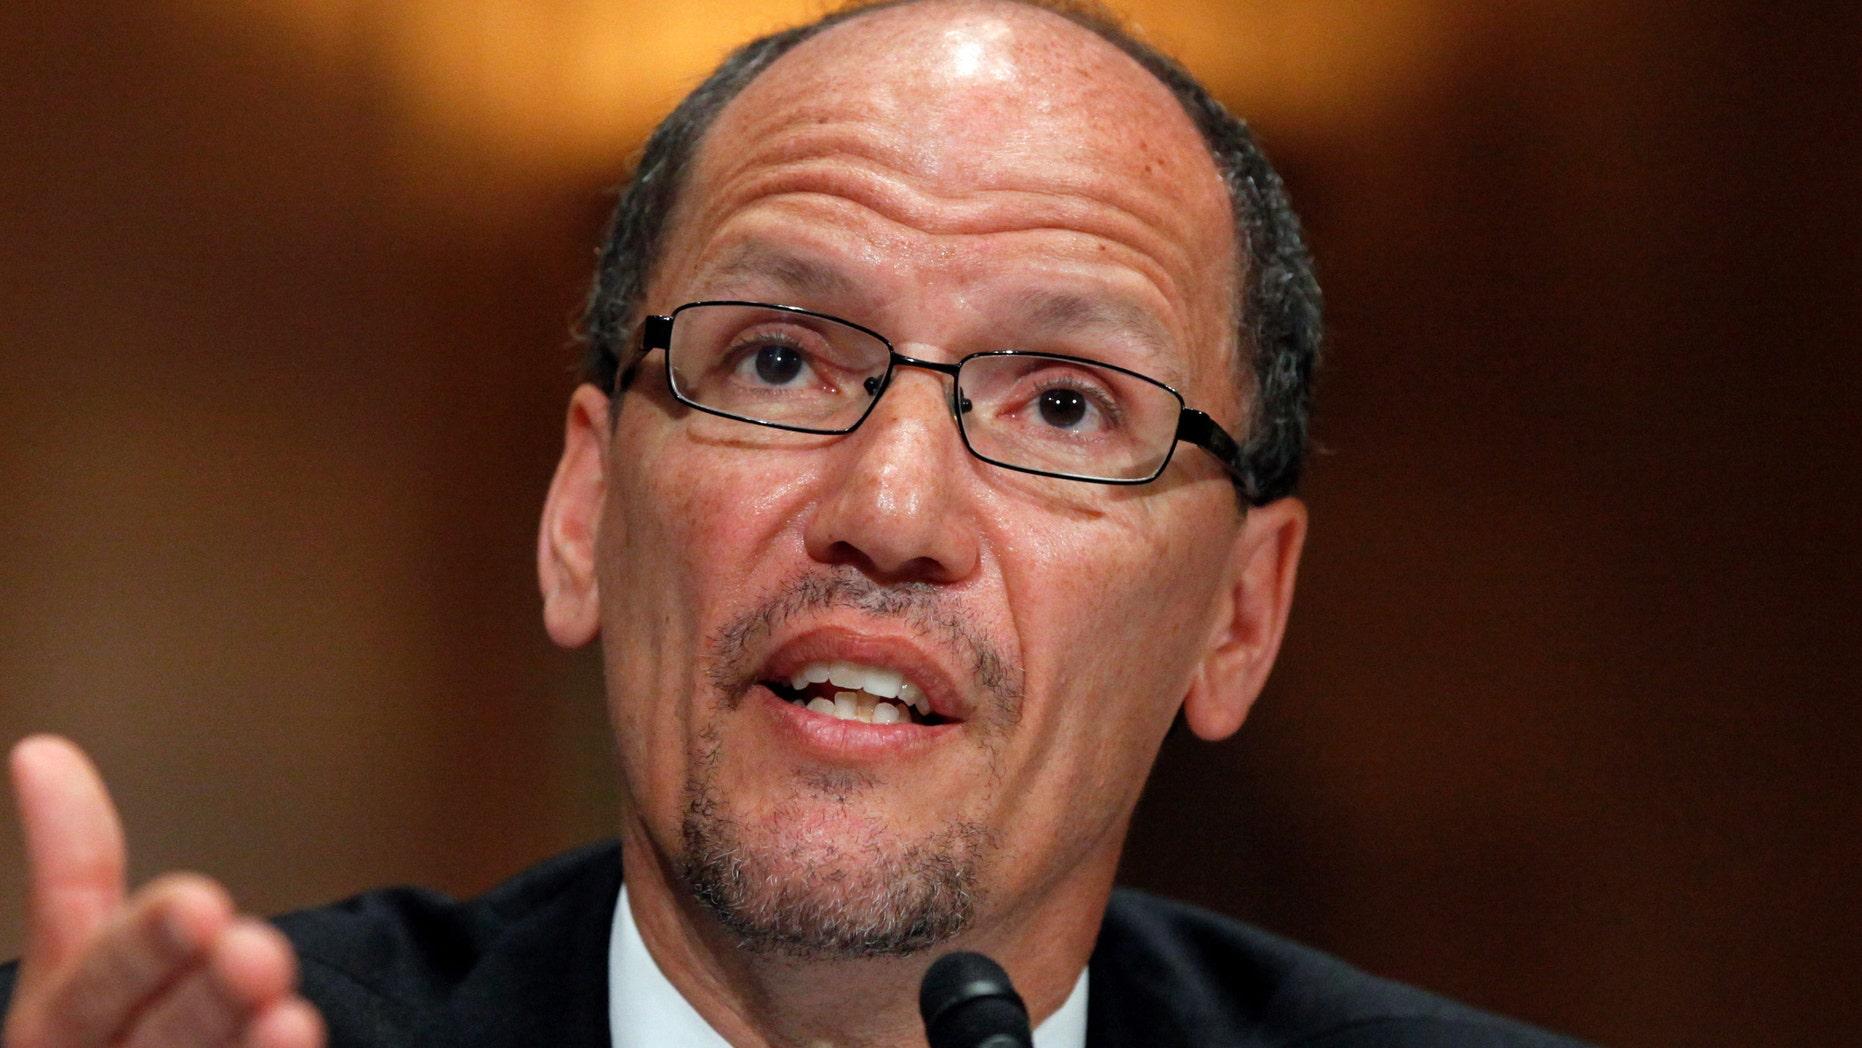 Labor Secretary nominee Thomas Perez testifies on Capitol Hill in Washington.